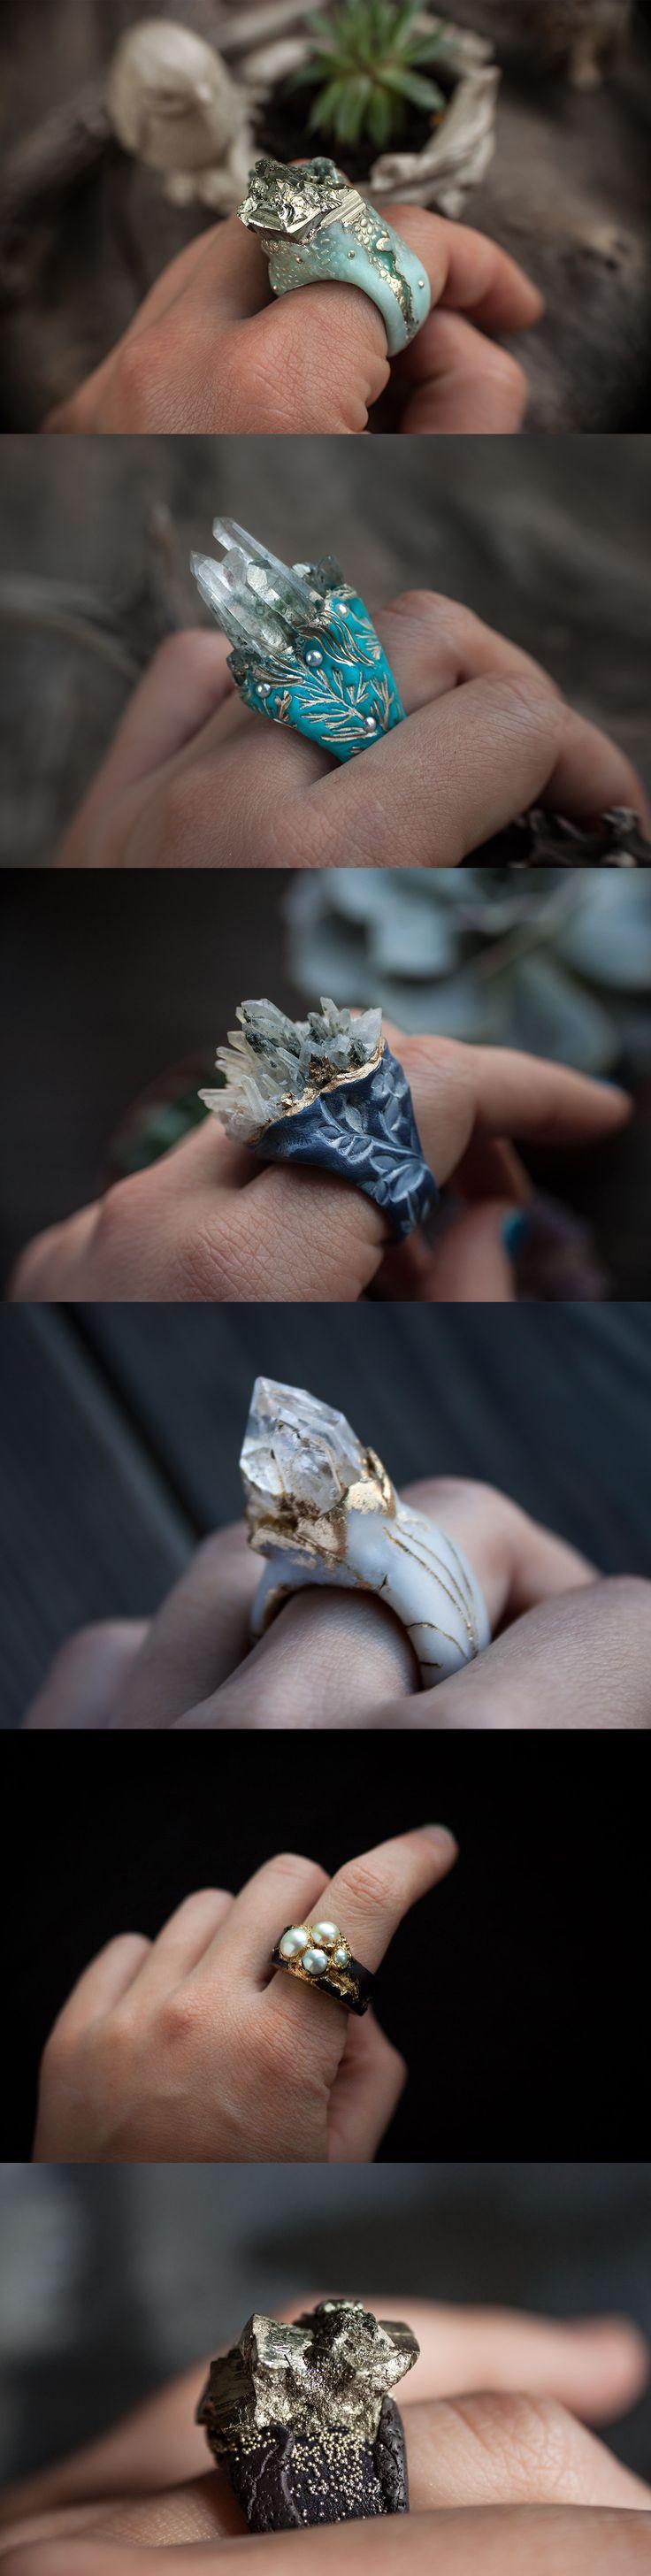 #ring #ellen rococo #polymer clay #jewelry